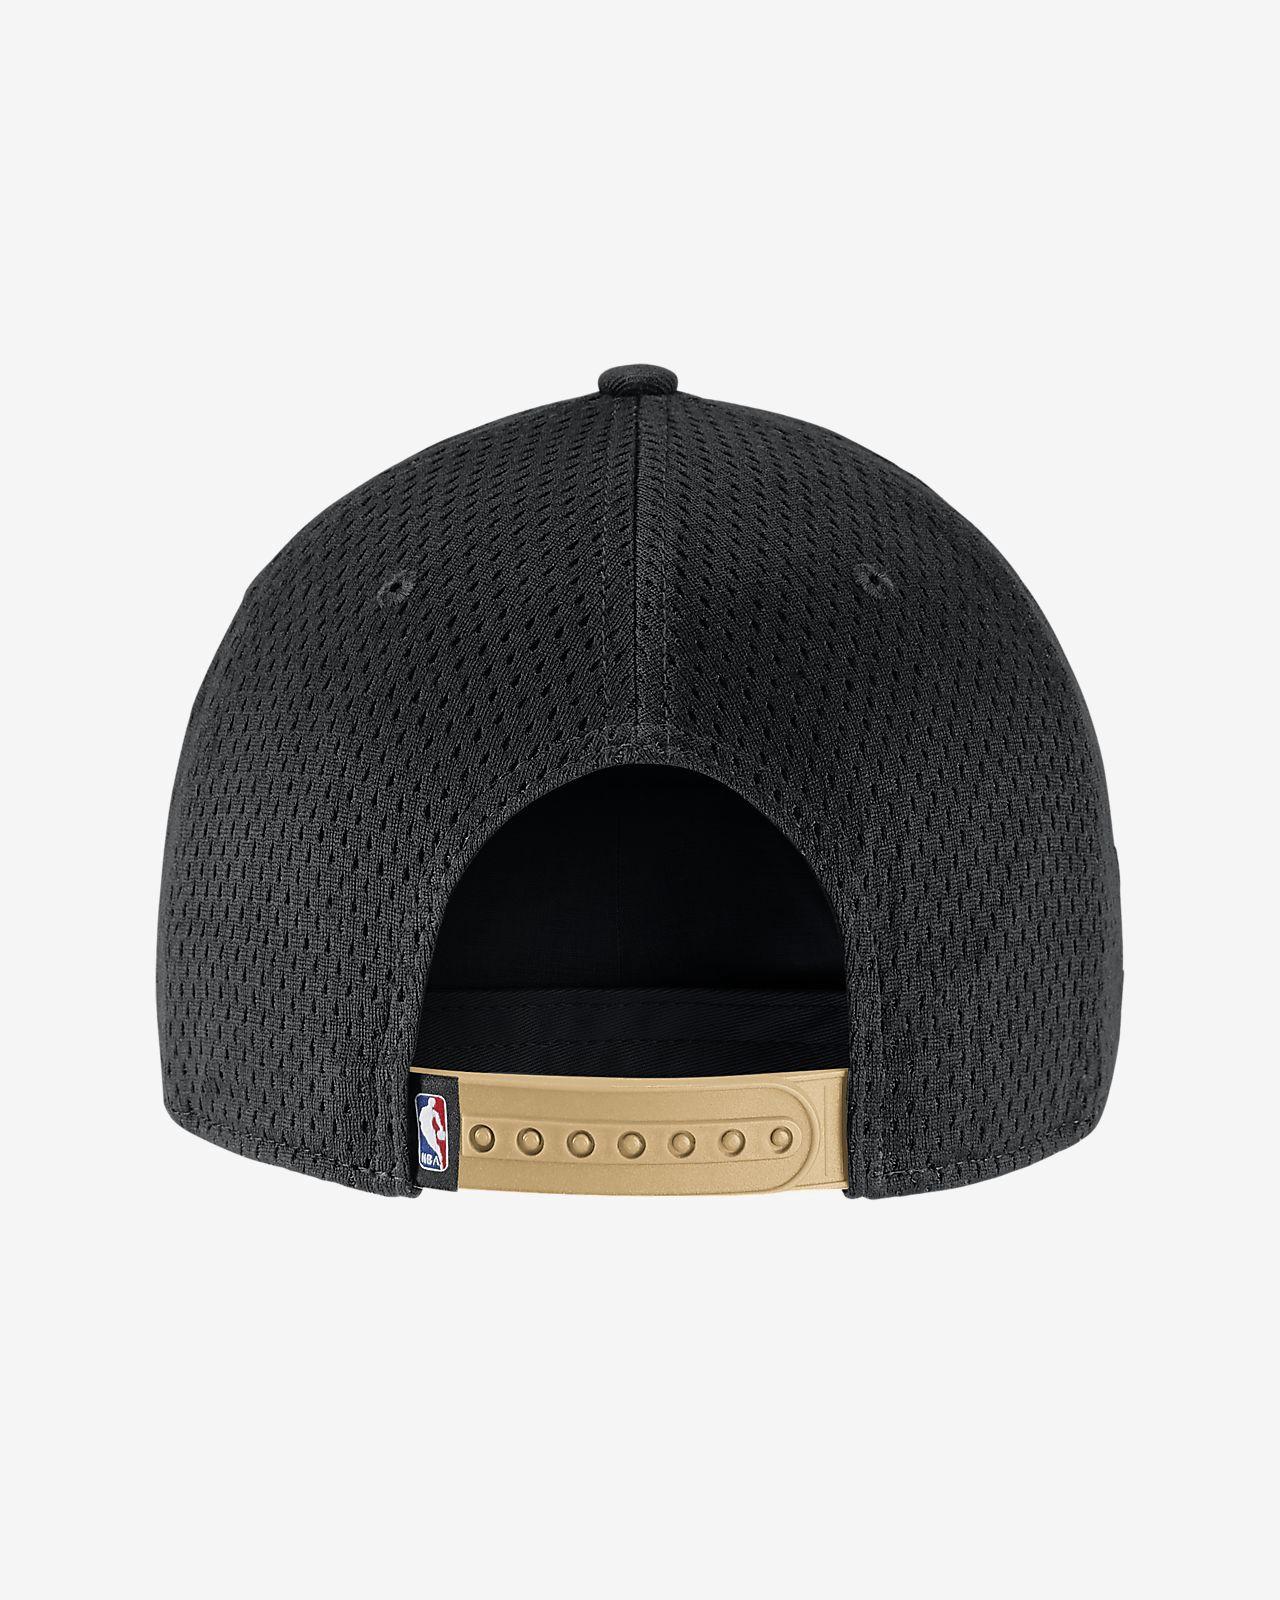 cf0d5143c3d Nike Toronto Raptors City Edition Classic99 Unisex Nba Hat - Gold ...